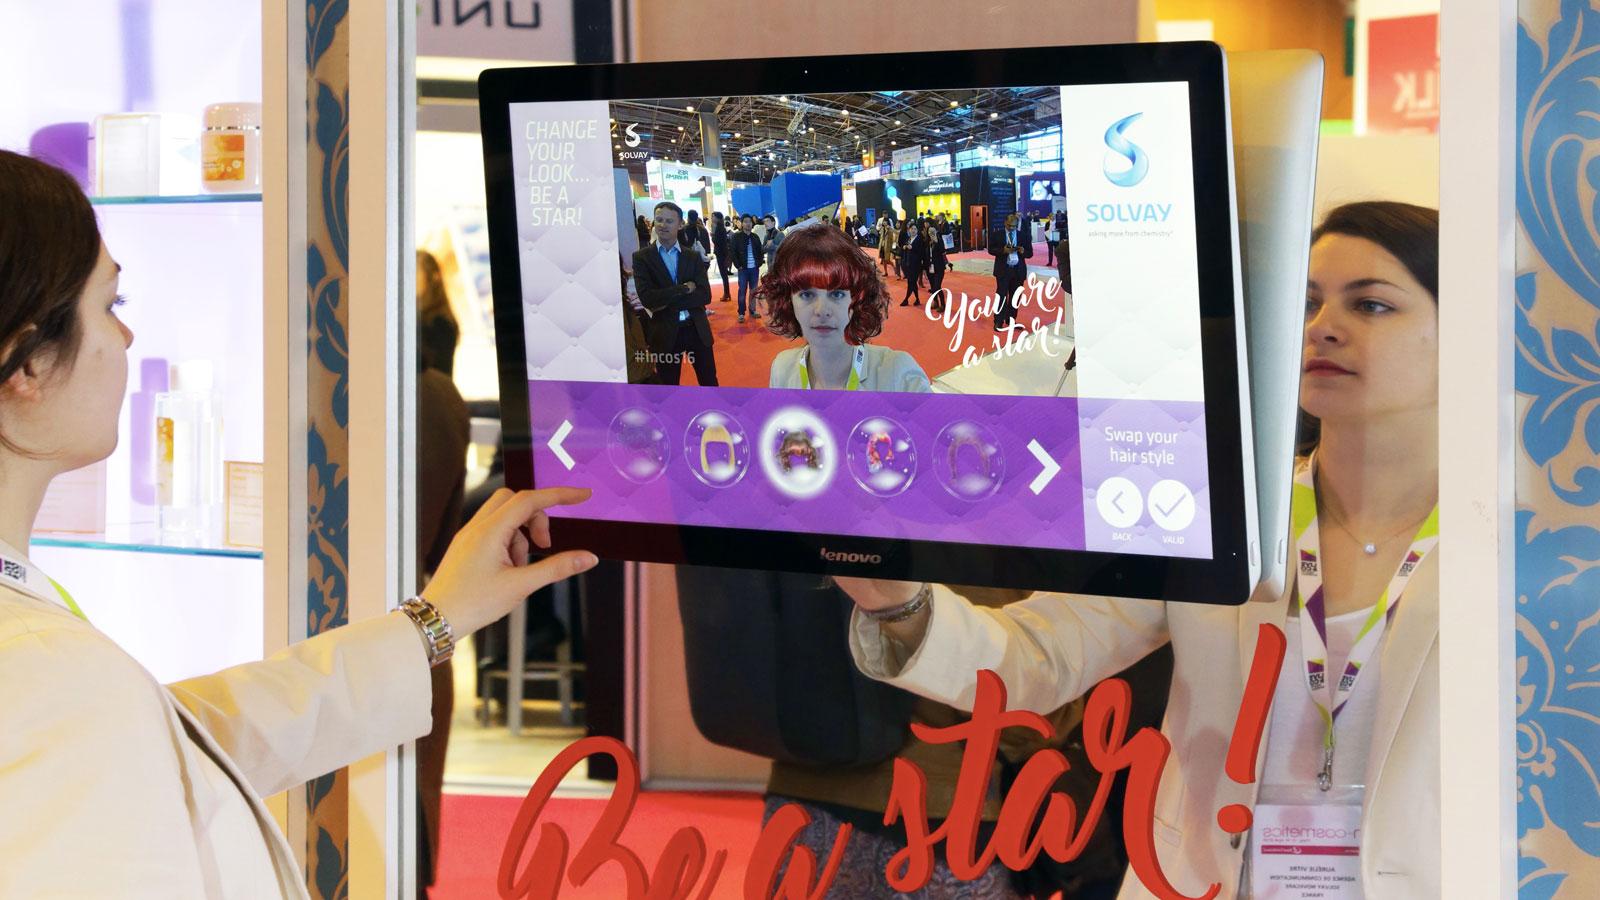 animation-sur-stand-Marketing-Digital-Gaming-Appli-Solvay-Novecare